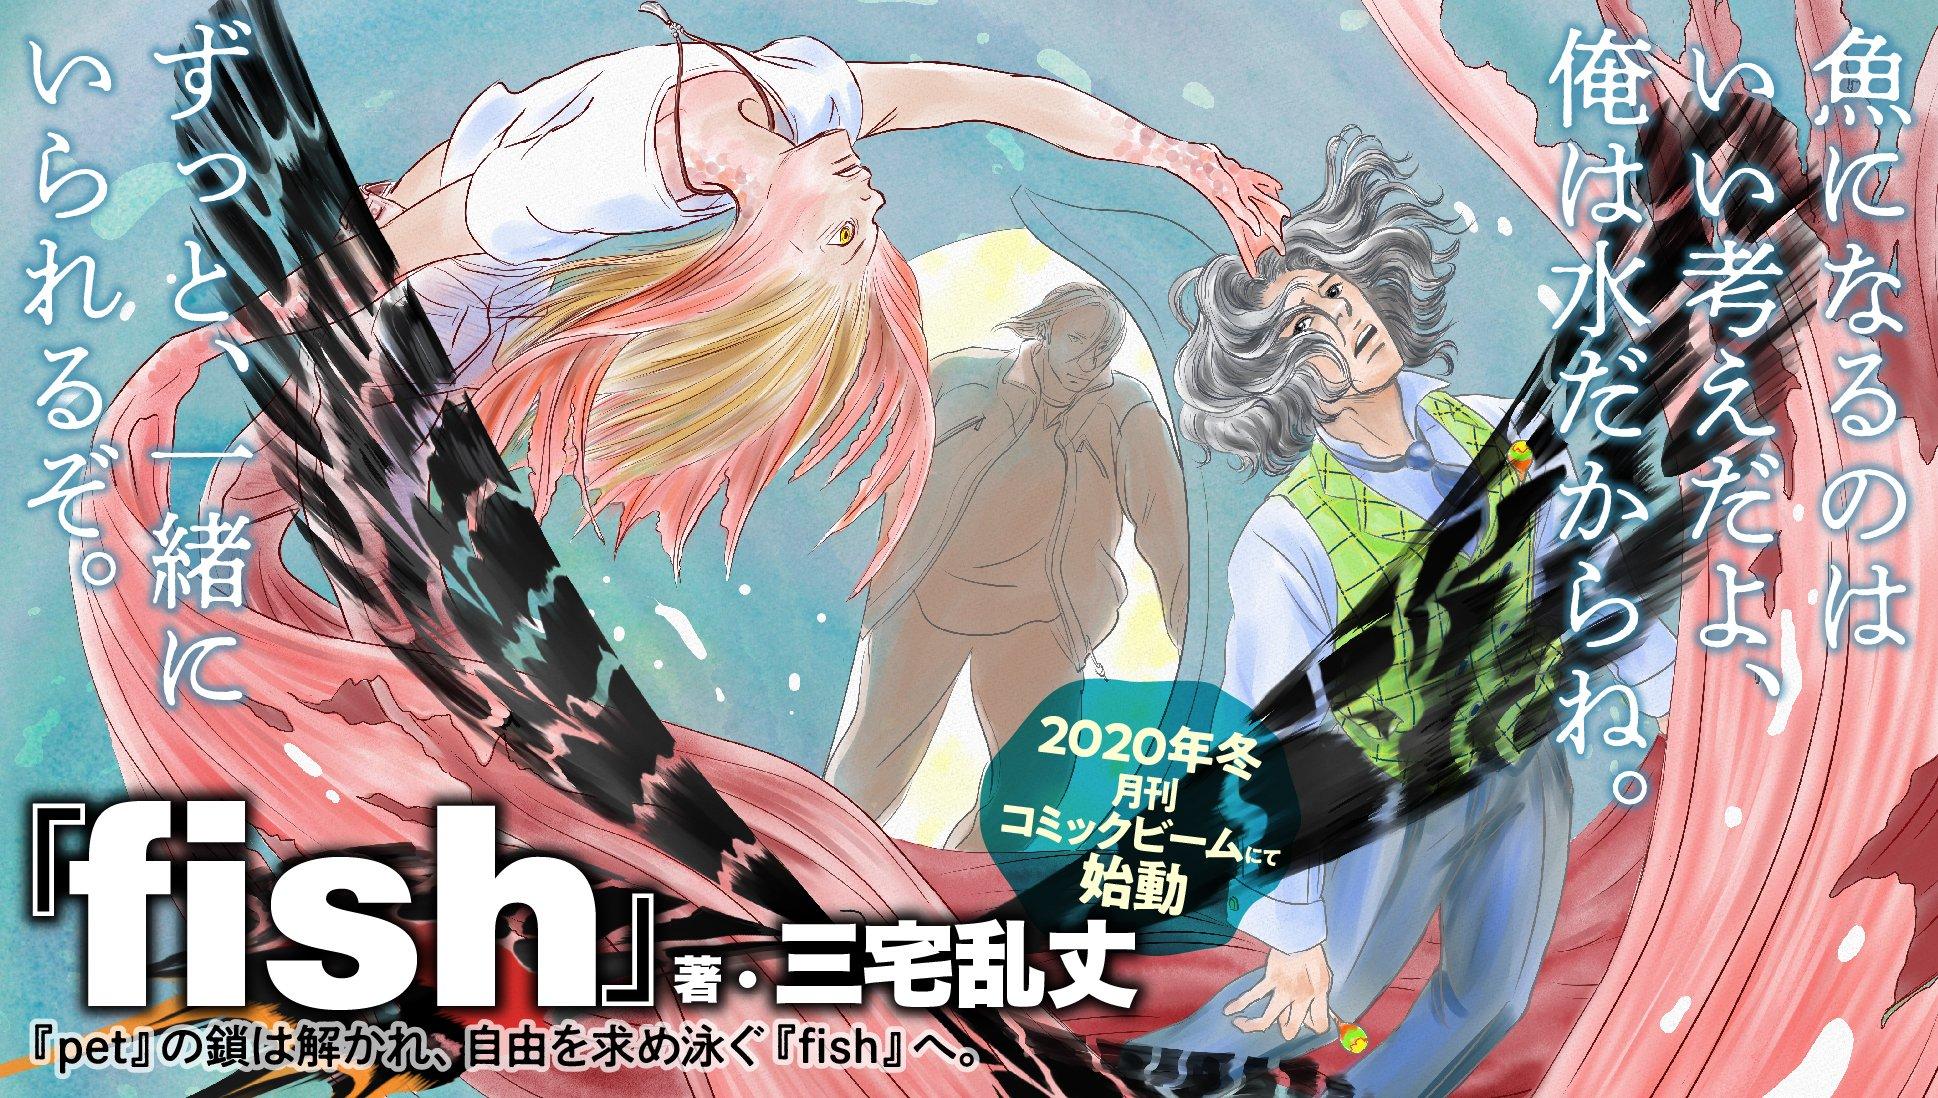 Sequel per il manga Pet